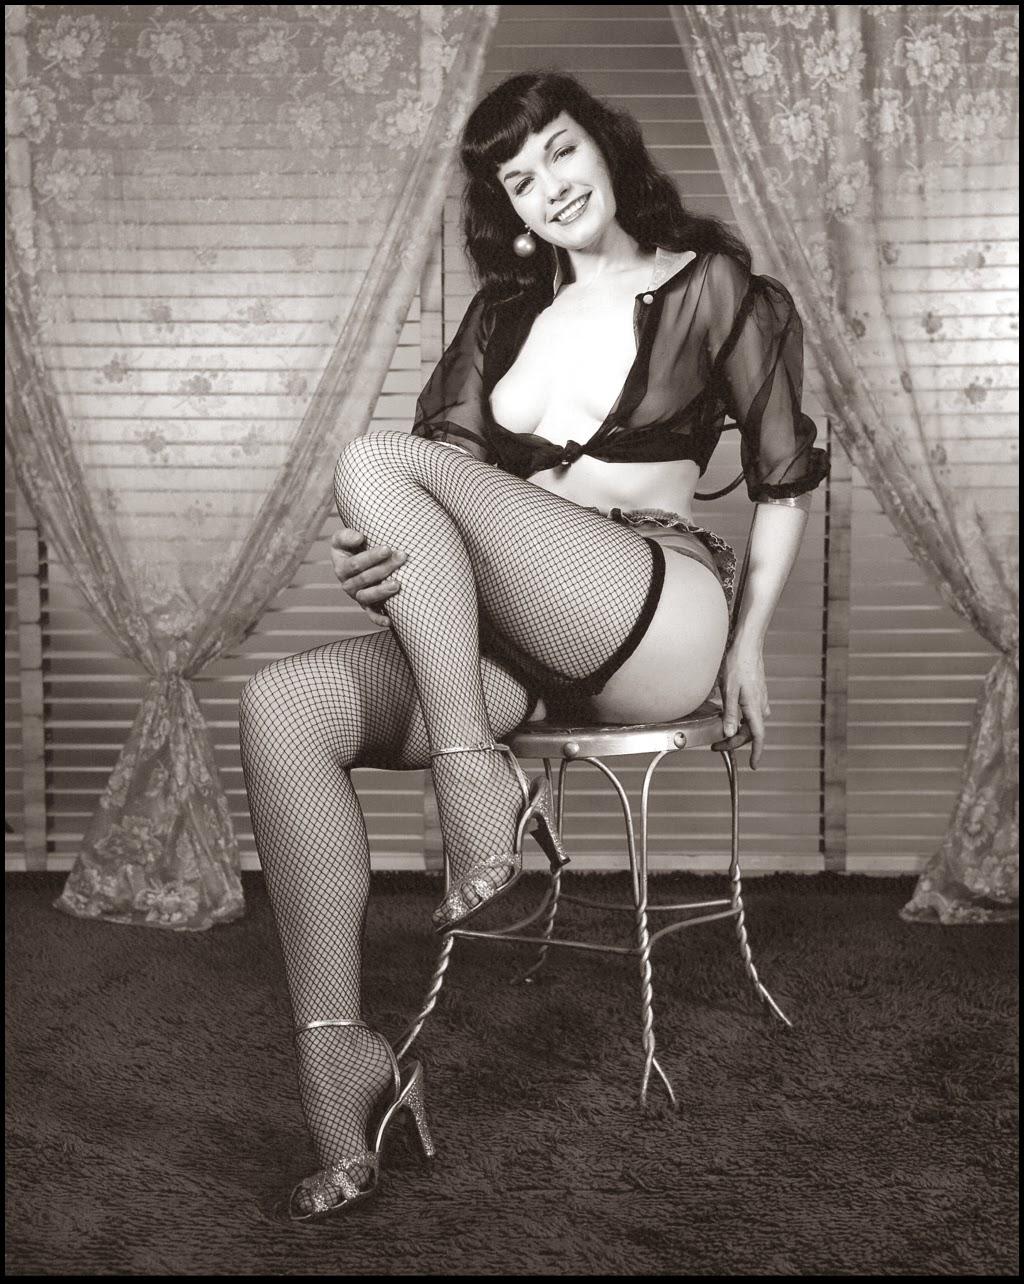 http://2.bp.blogspot.com/-axFophwWlZ8/U1aMUqdDS5I/AAAAAAAAEZI/n7E_P0qGVtA/s1600/bettie+page+stockings.jpg